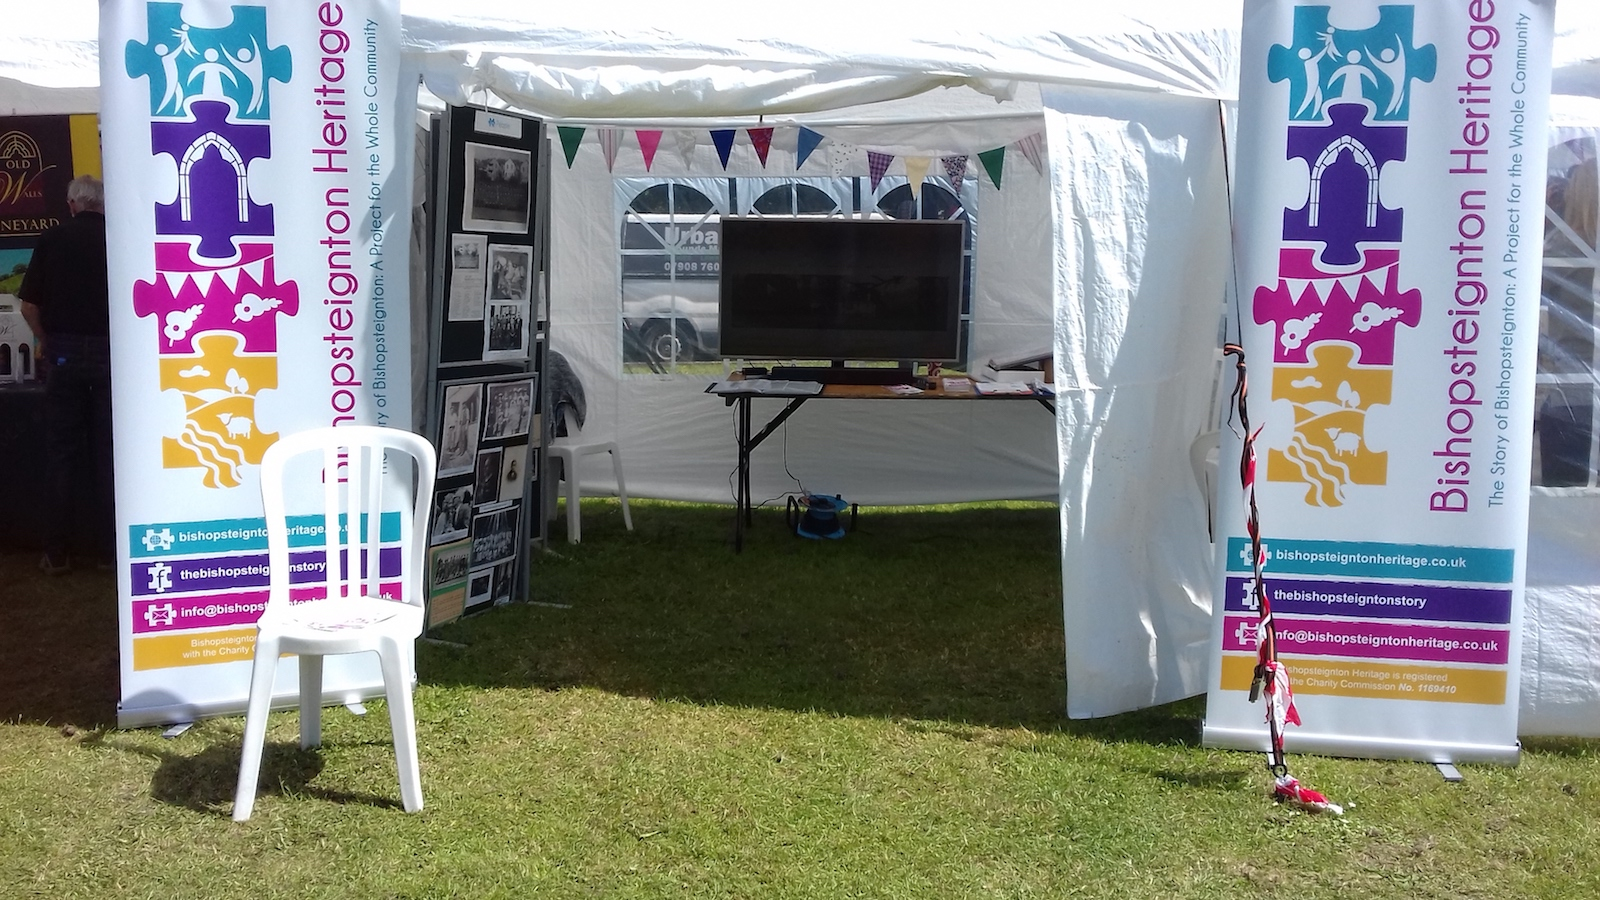 Bishopsteignton Heritage festival tent